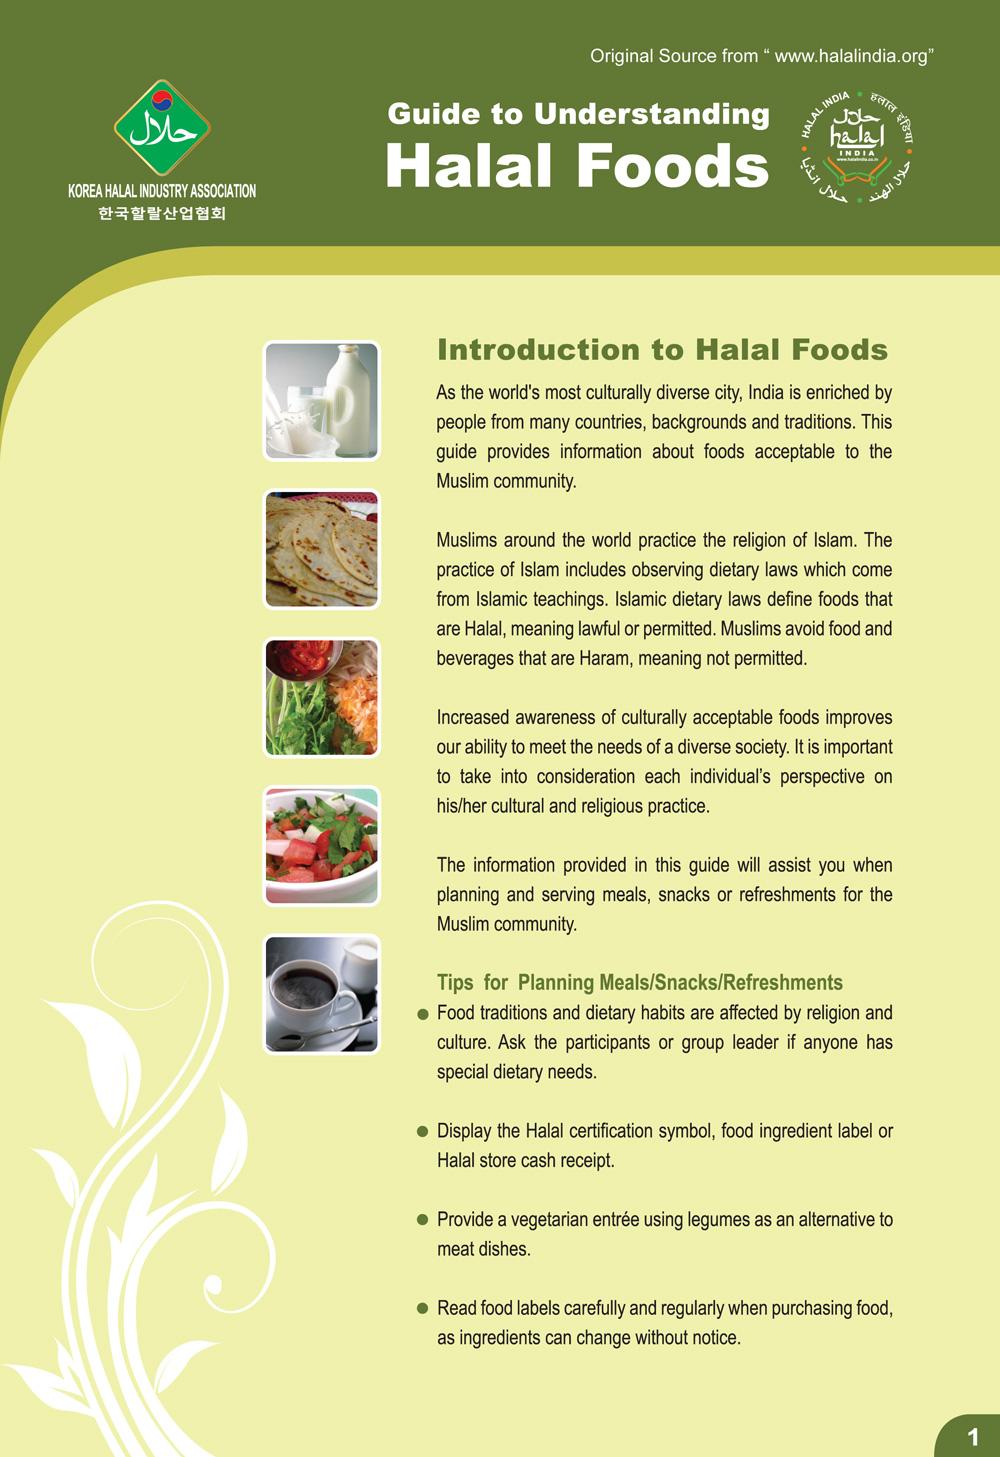 halal-food-guide-1